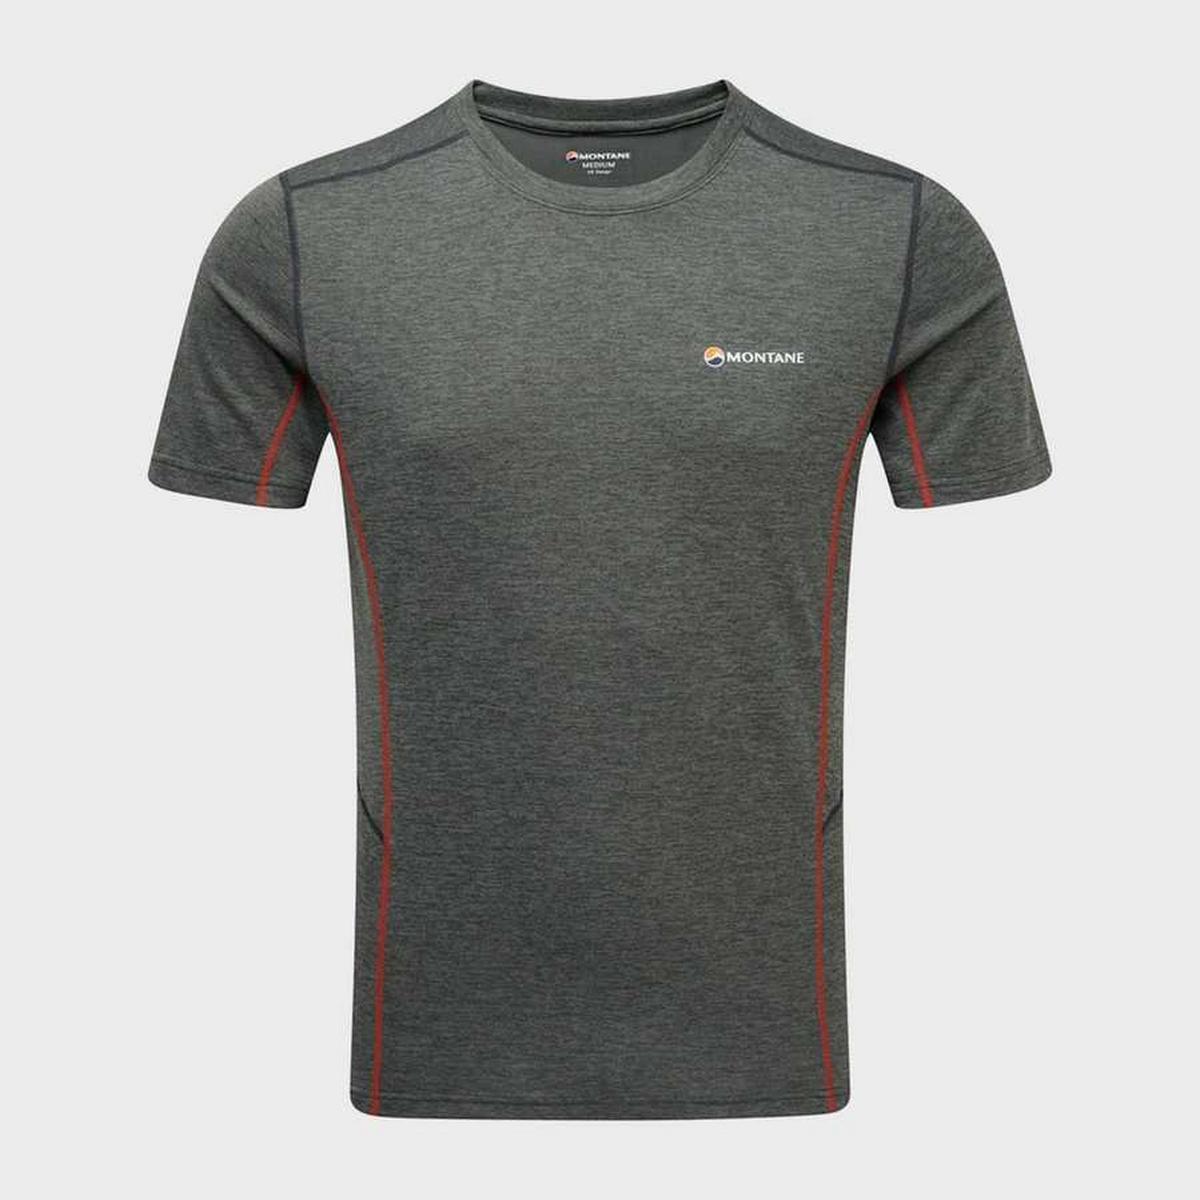 Montane Men's Dart T-Shirt - Grey